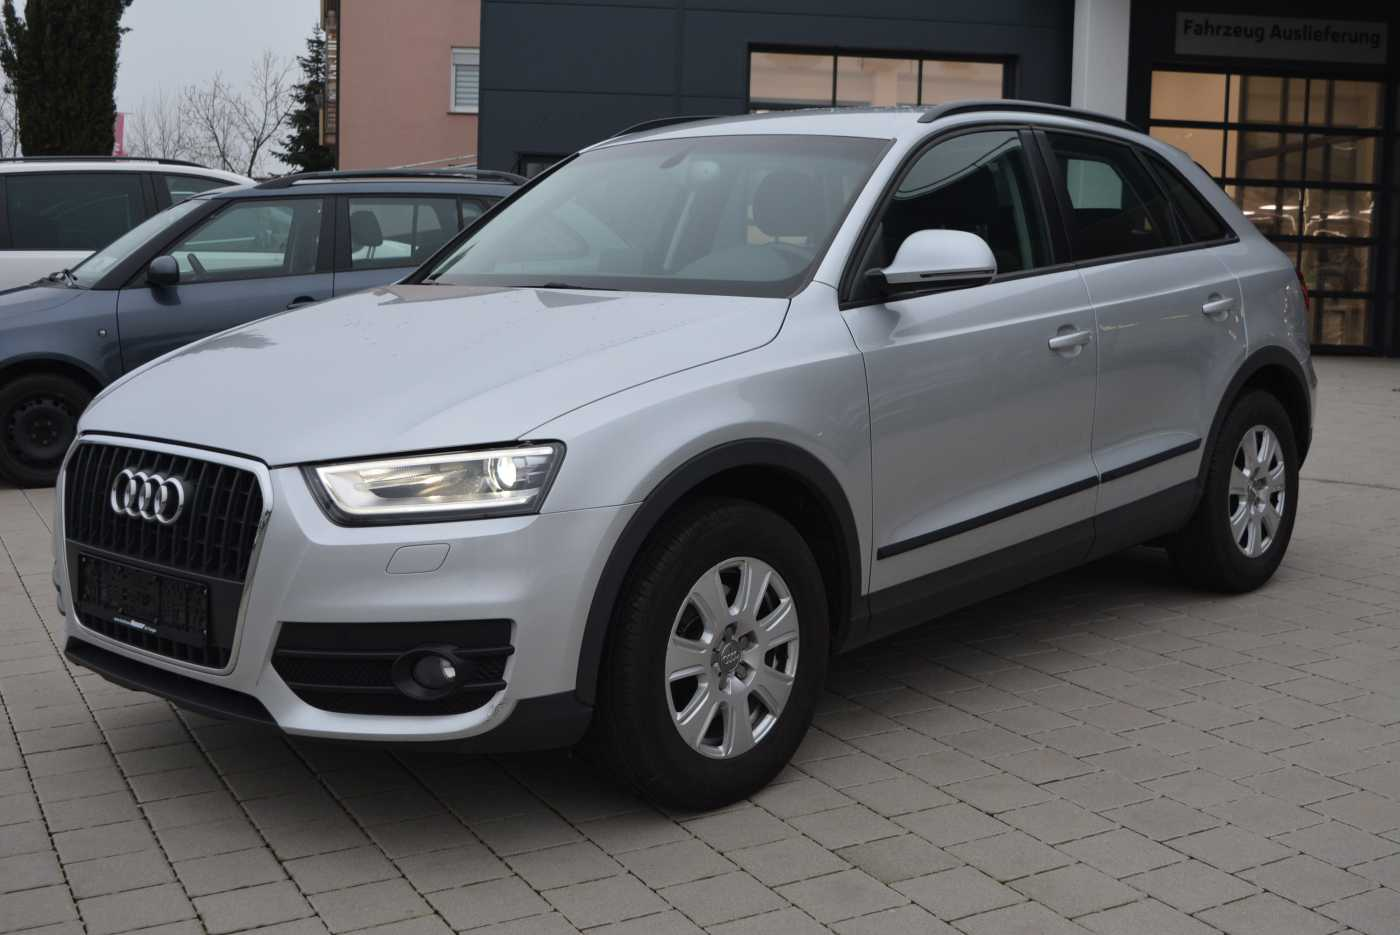 Audi Q3 2.0 TDI Navi,AHK,Xenon,SHZ,PDC,BT,16', Jahr 2013, Diesel